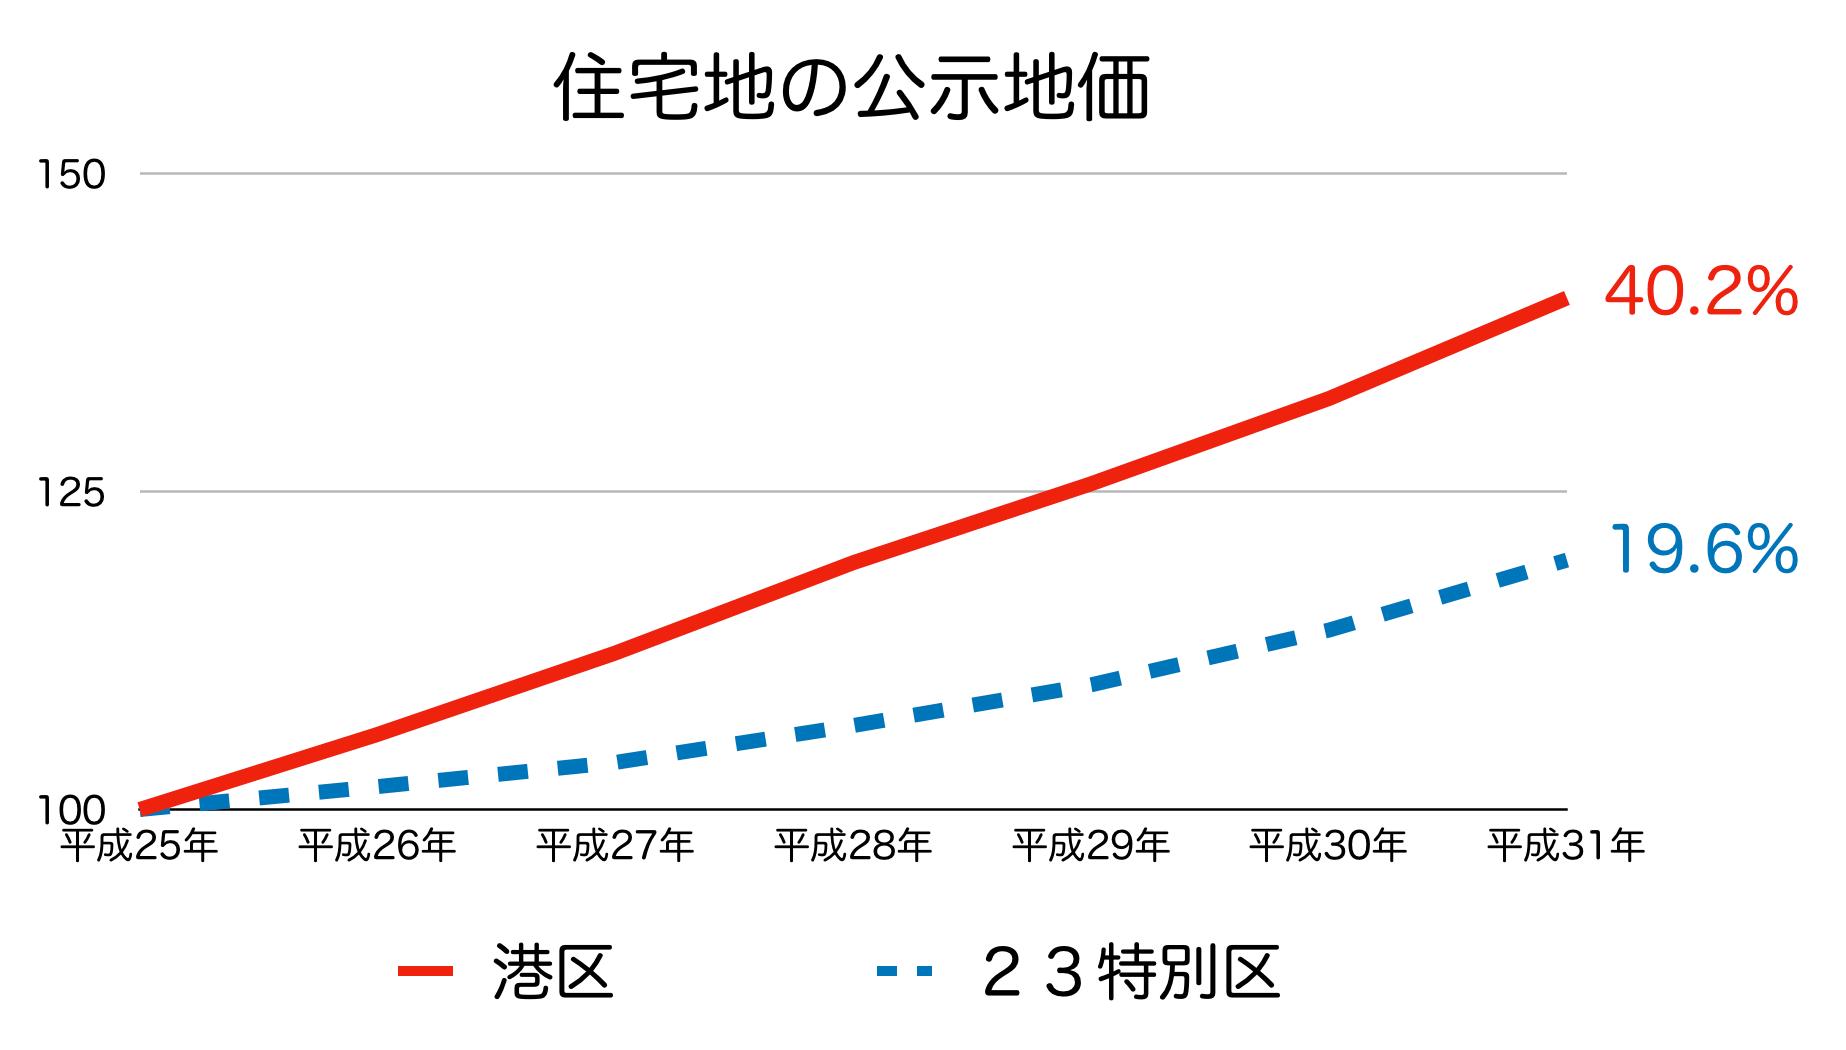 東京都港区の公示地価 H25-H31